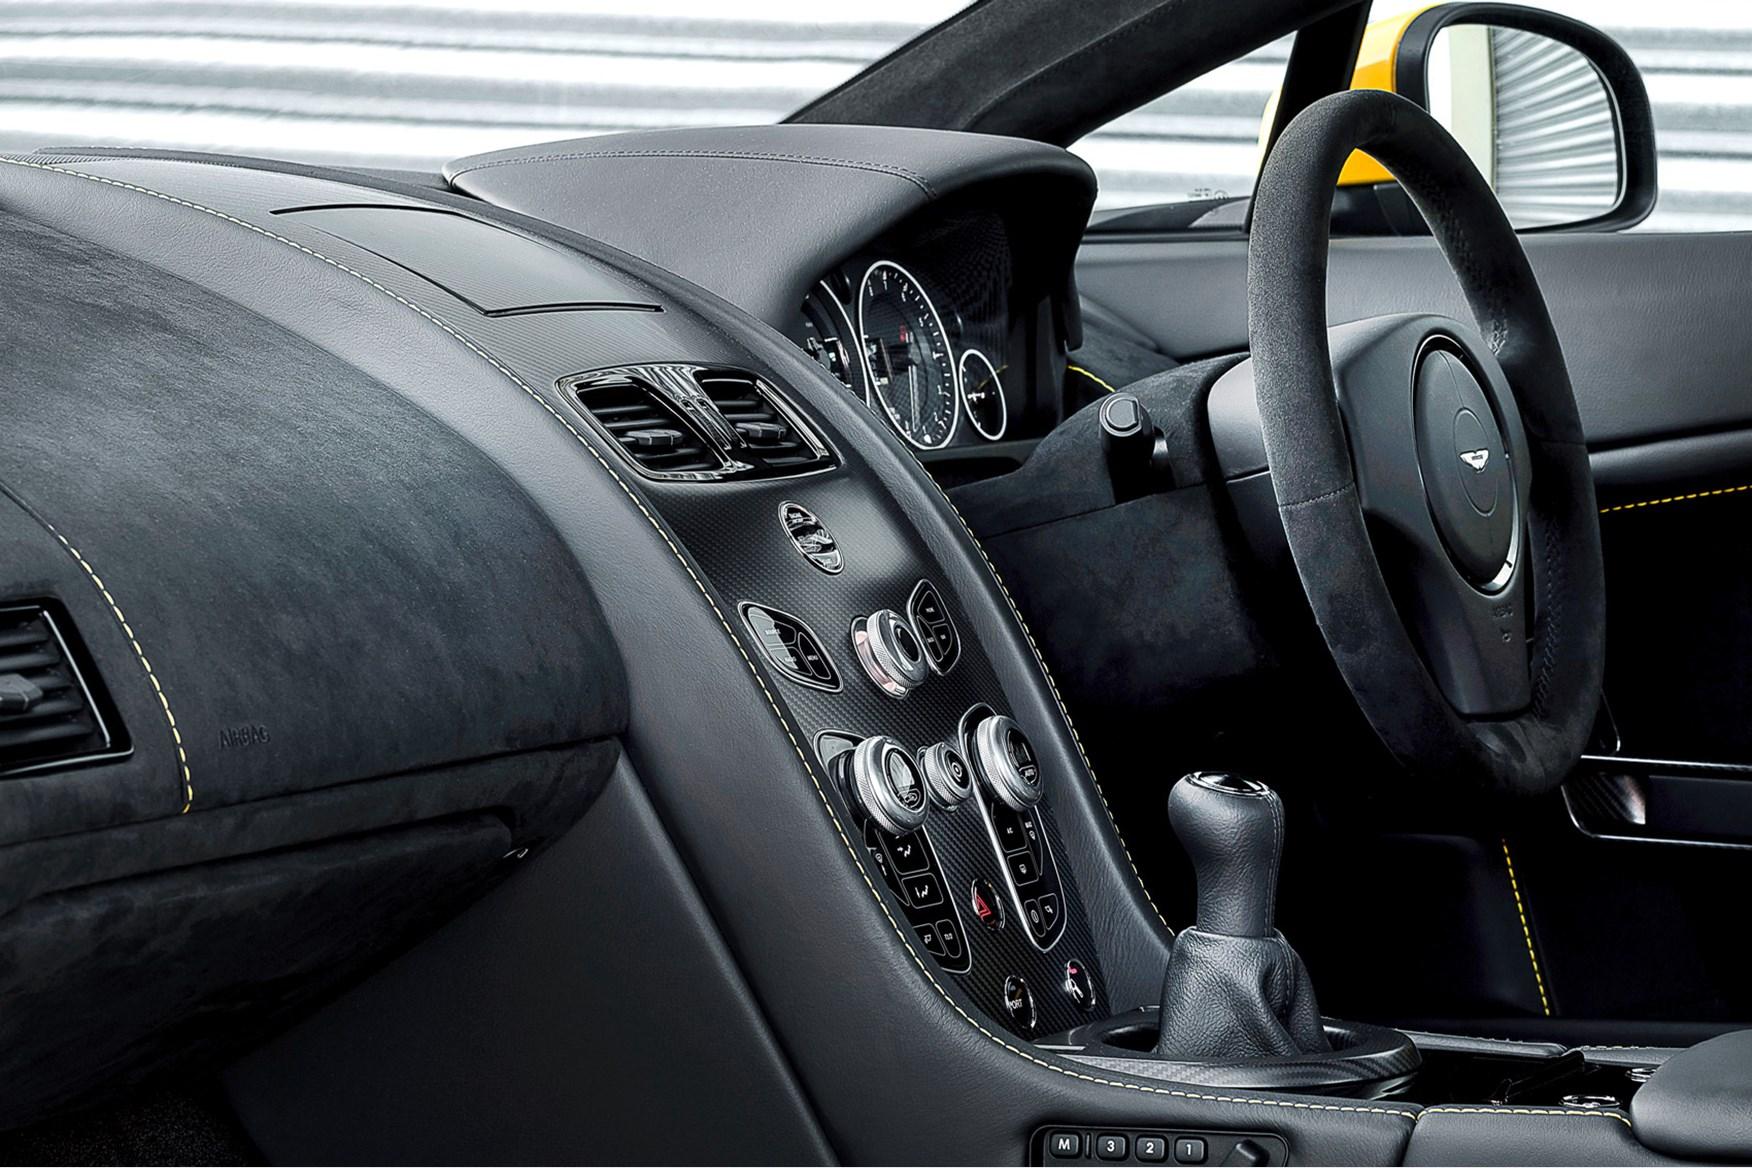 Aston Martin V12 Vantage S Manual First Drive  Car  June